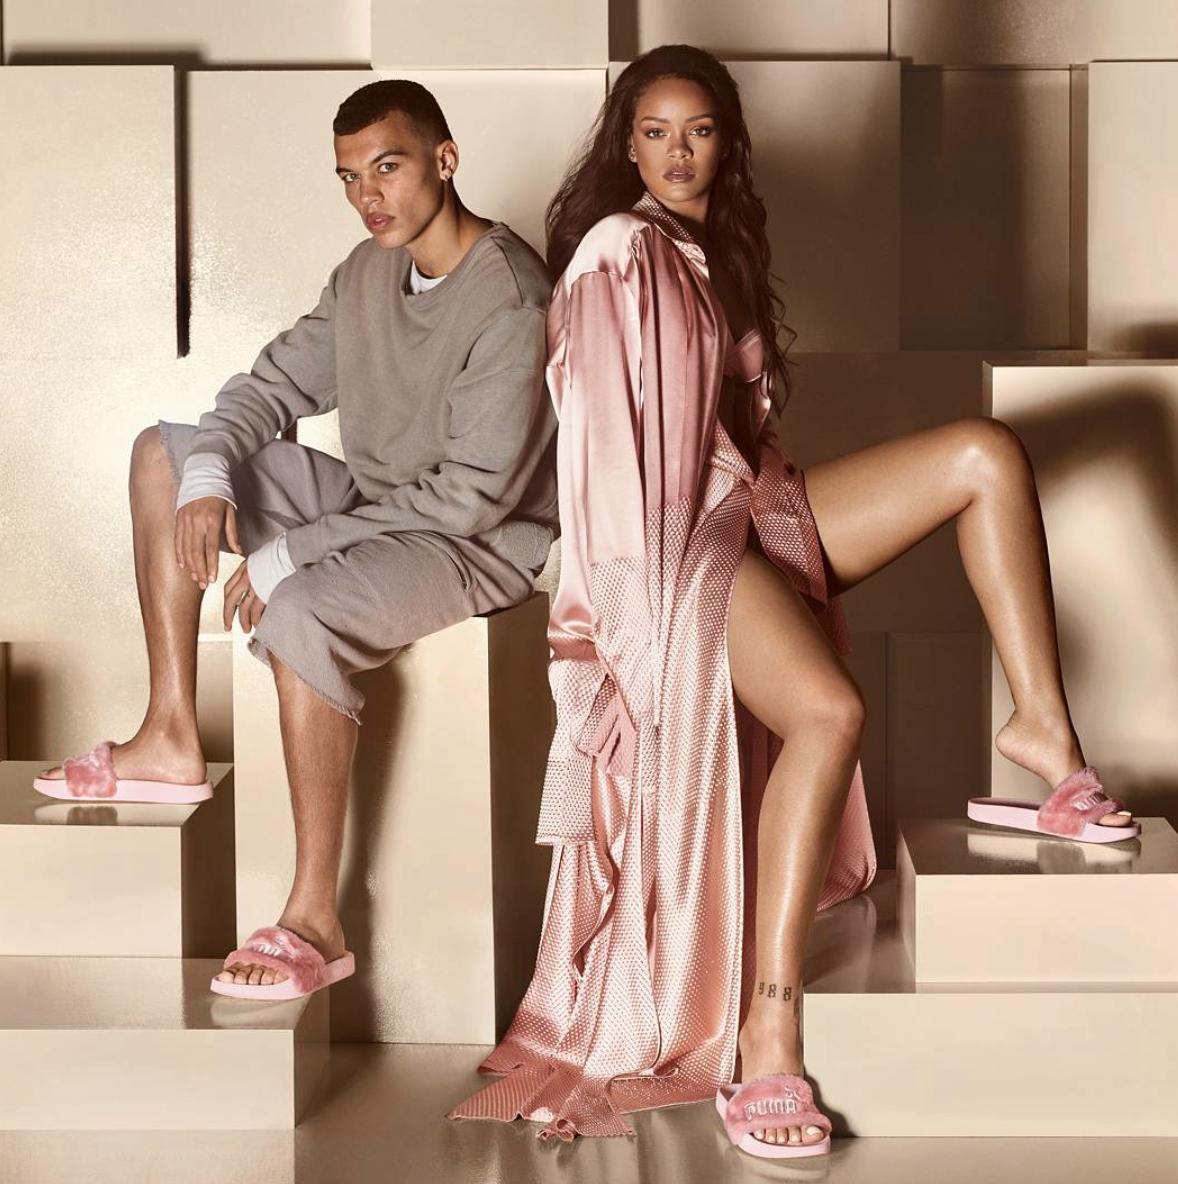 Krznene natikače koje potpisuje Rihanna